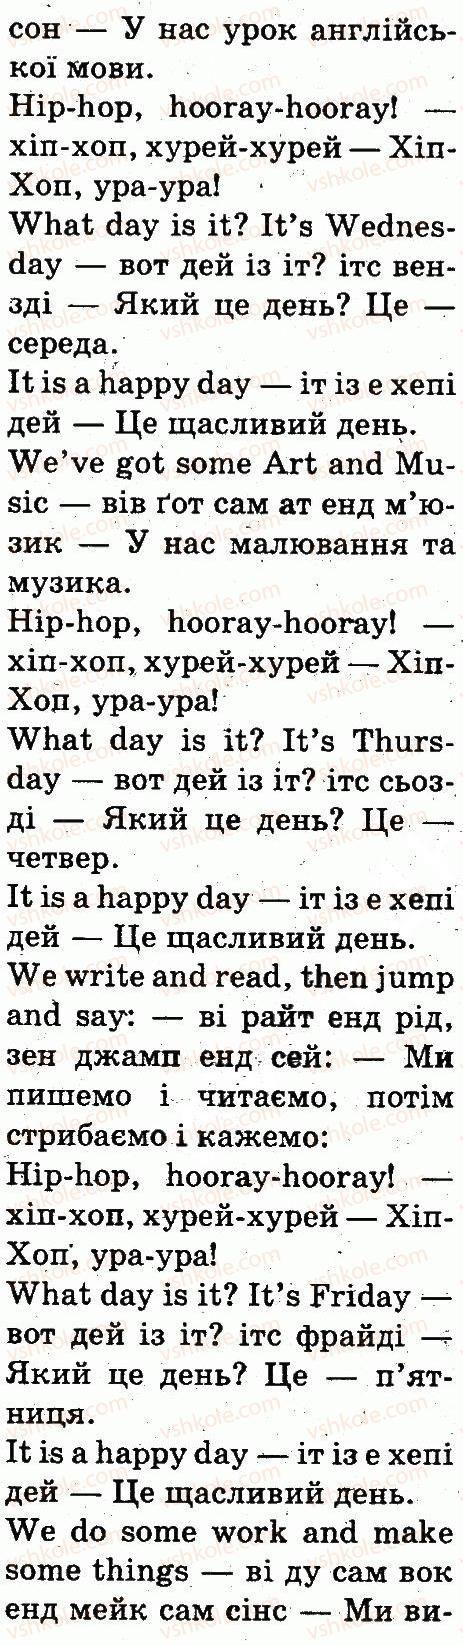 3-anglijska-mova-od-karpyuk-2013--unit-3-welcome-back-to-school-lesson-3-4-rnd7059.jpg